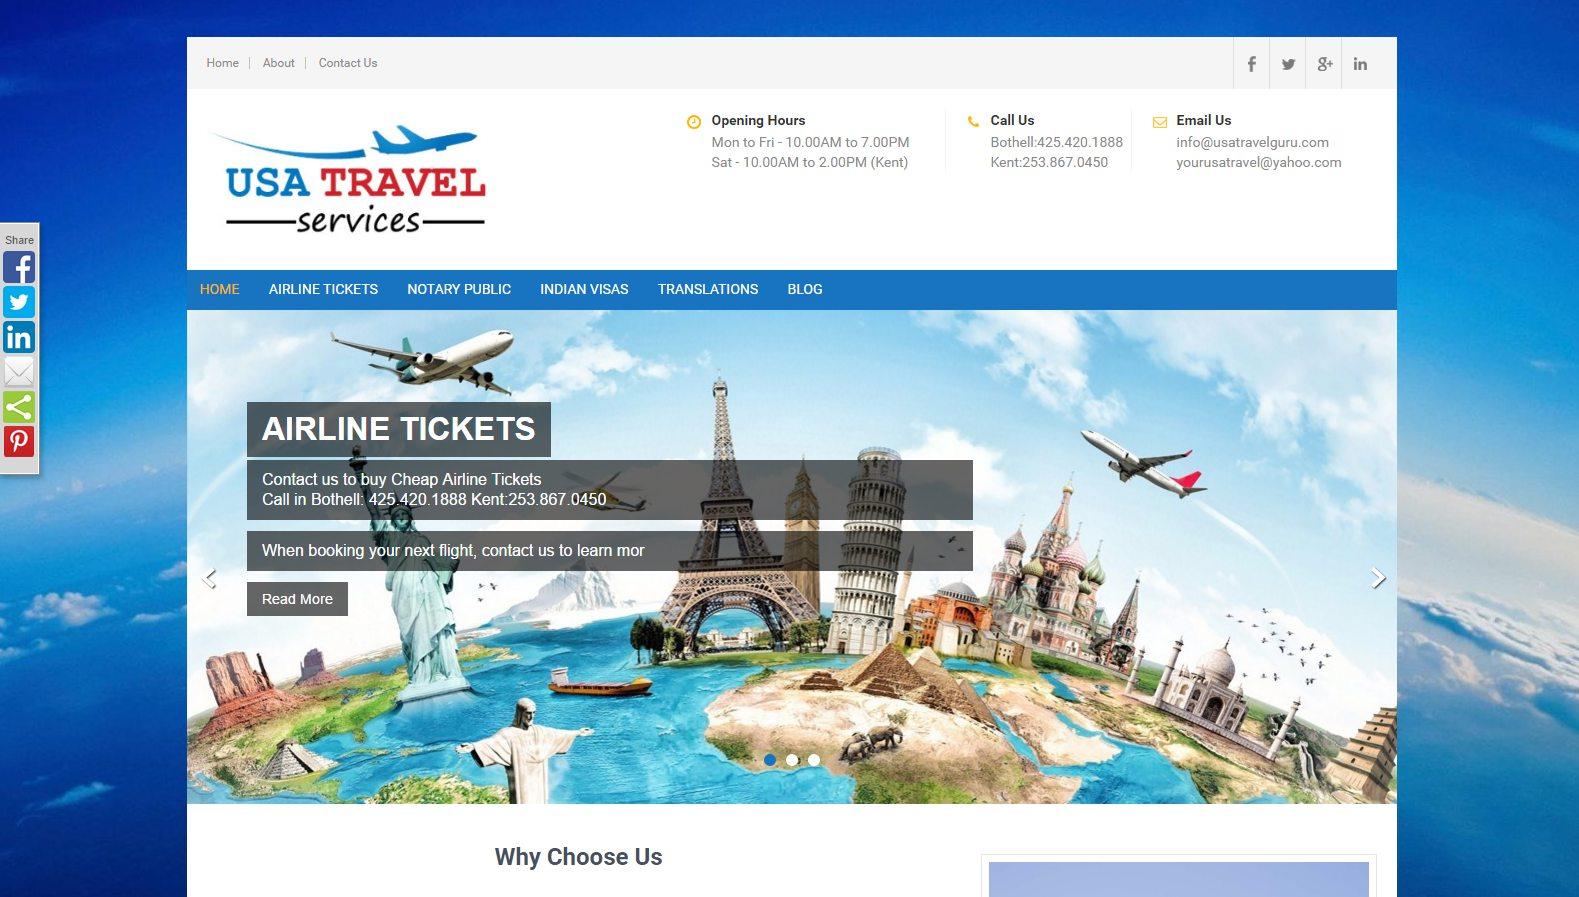 USA Travel - Website Designing By SEOTeam.ca